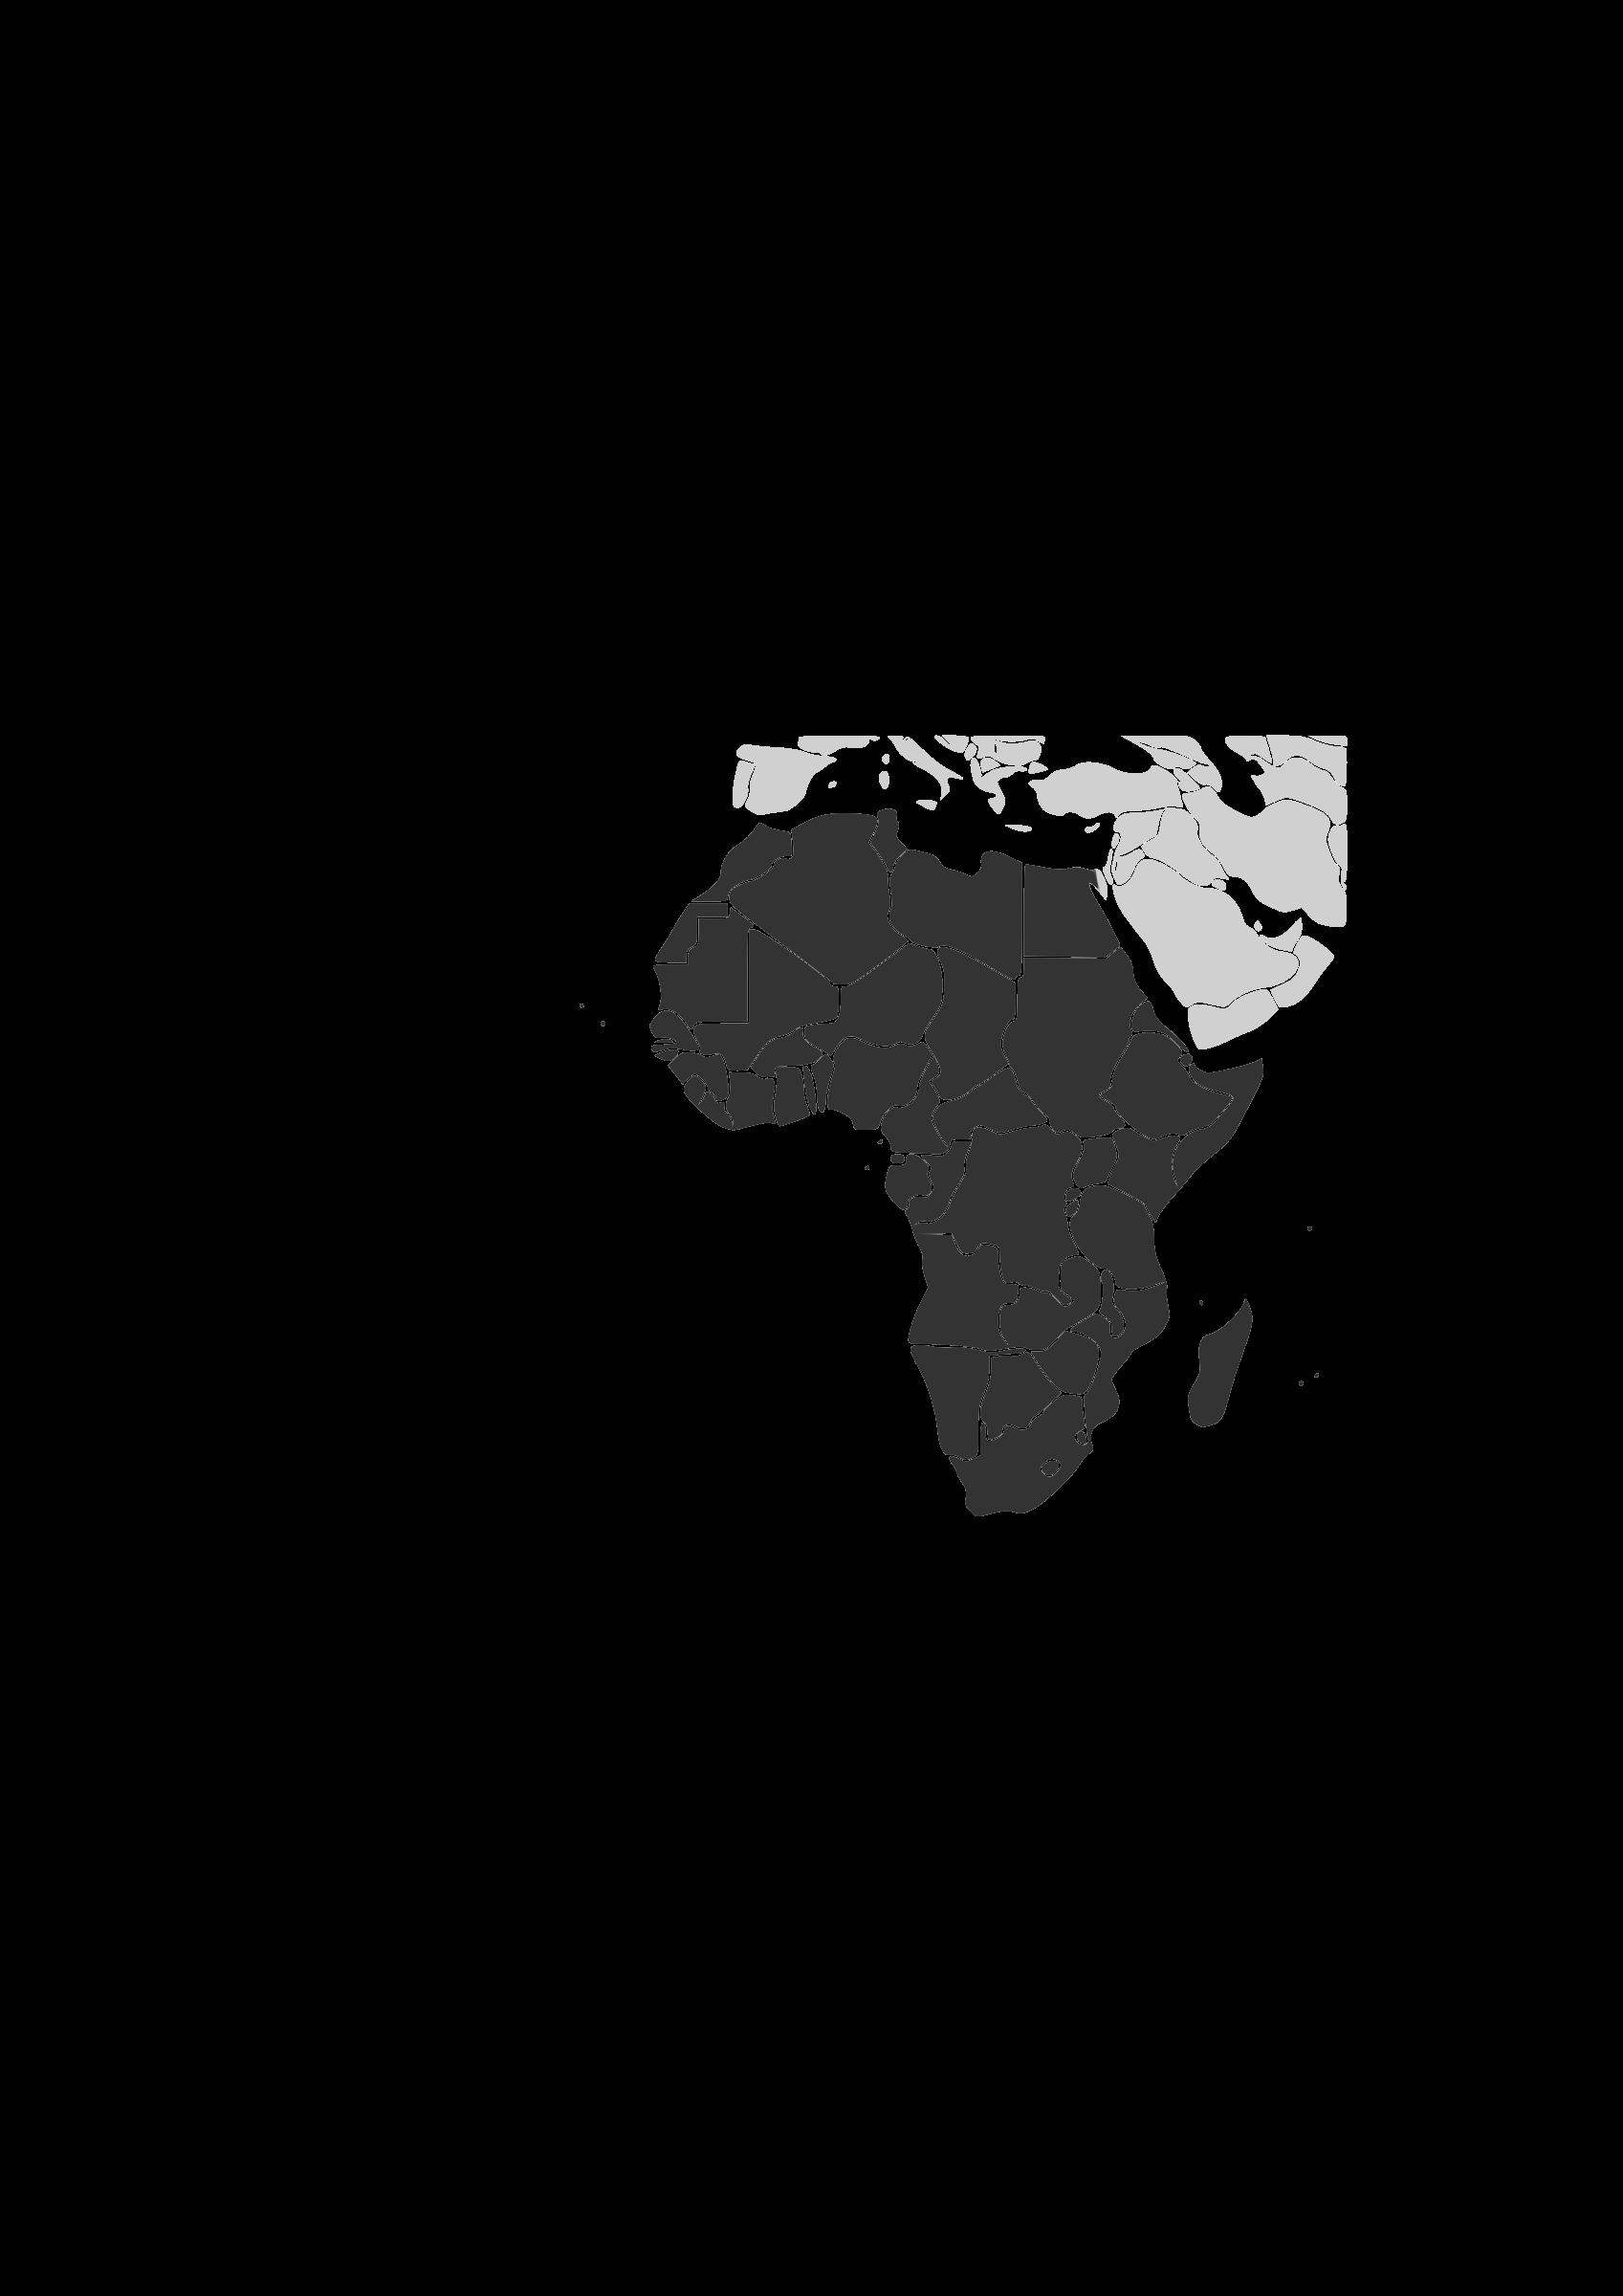 Continent clipart africa Continent Clipart Africa continent Africa